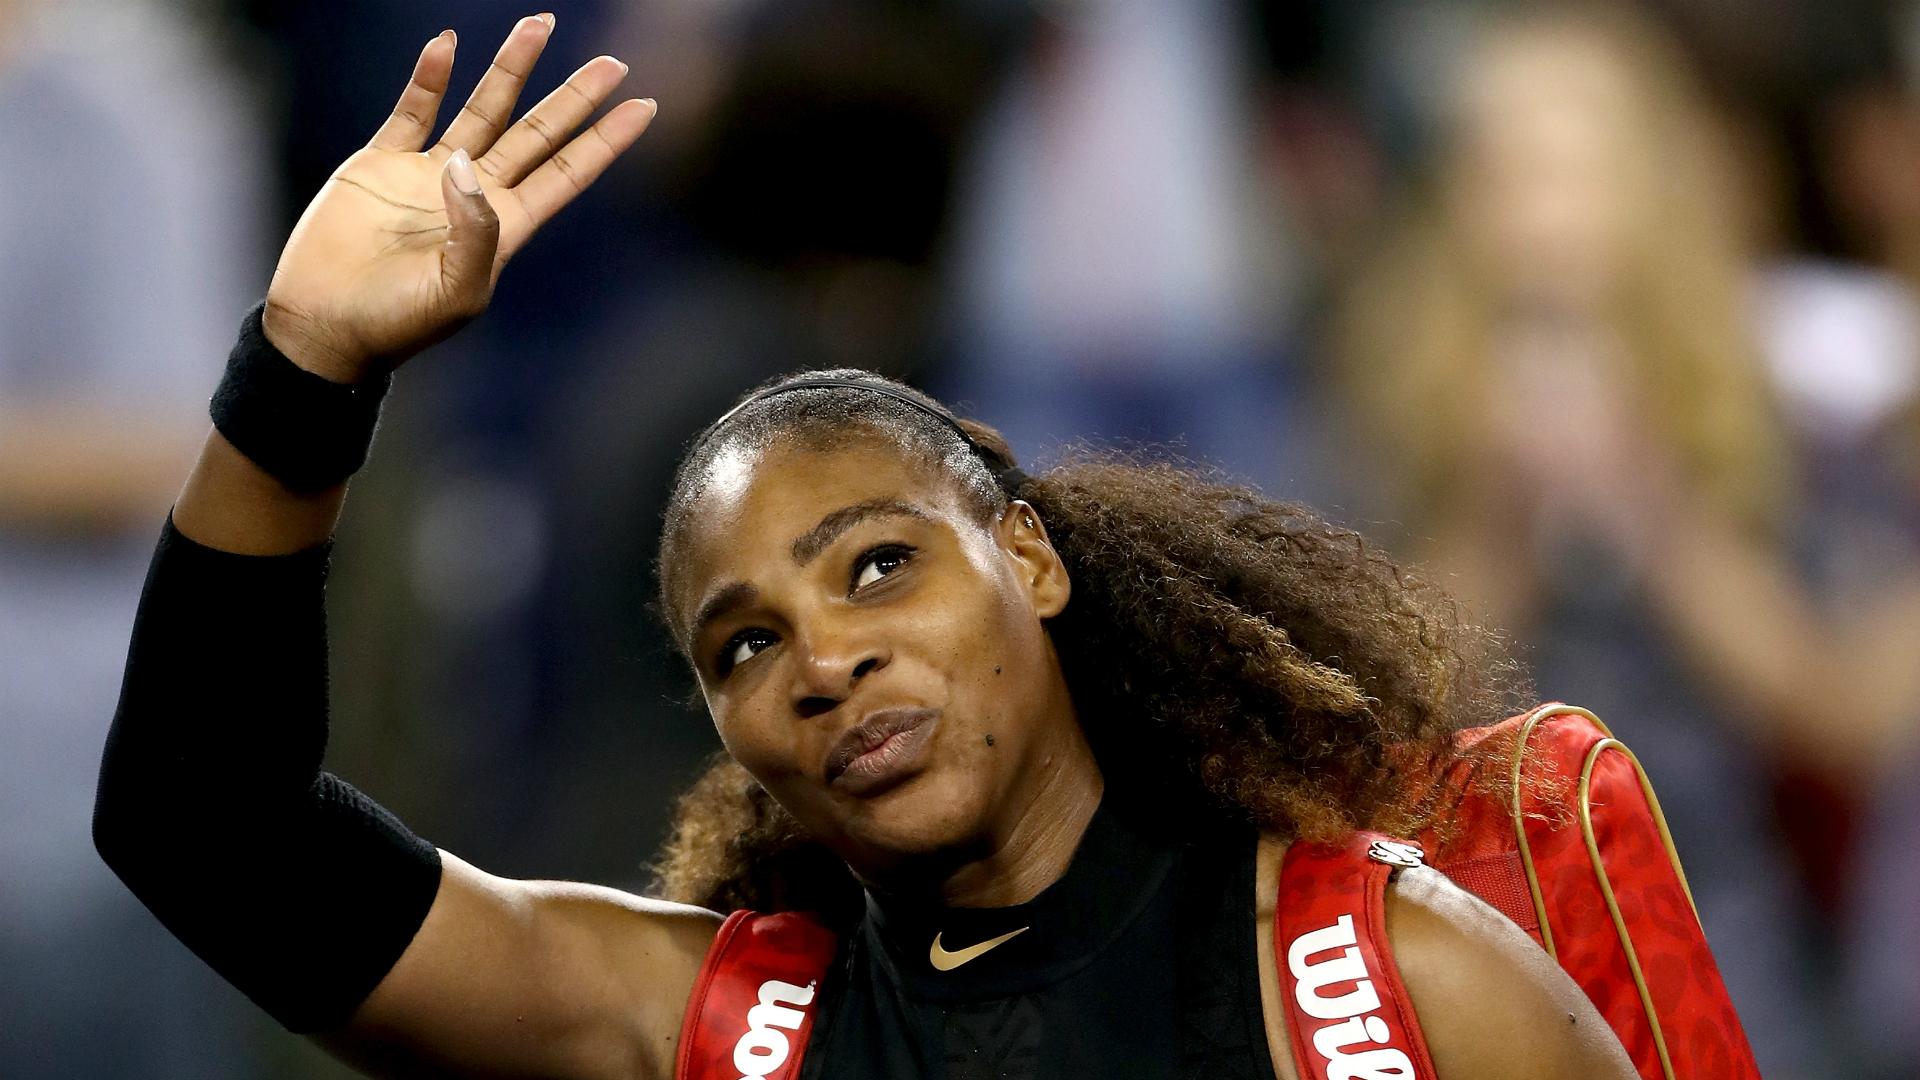 Serena Williams revels in 'incredible' win